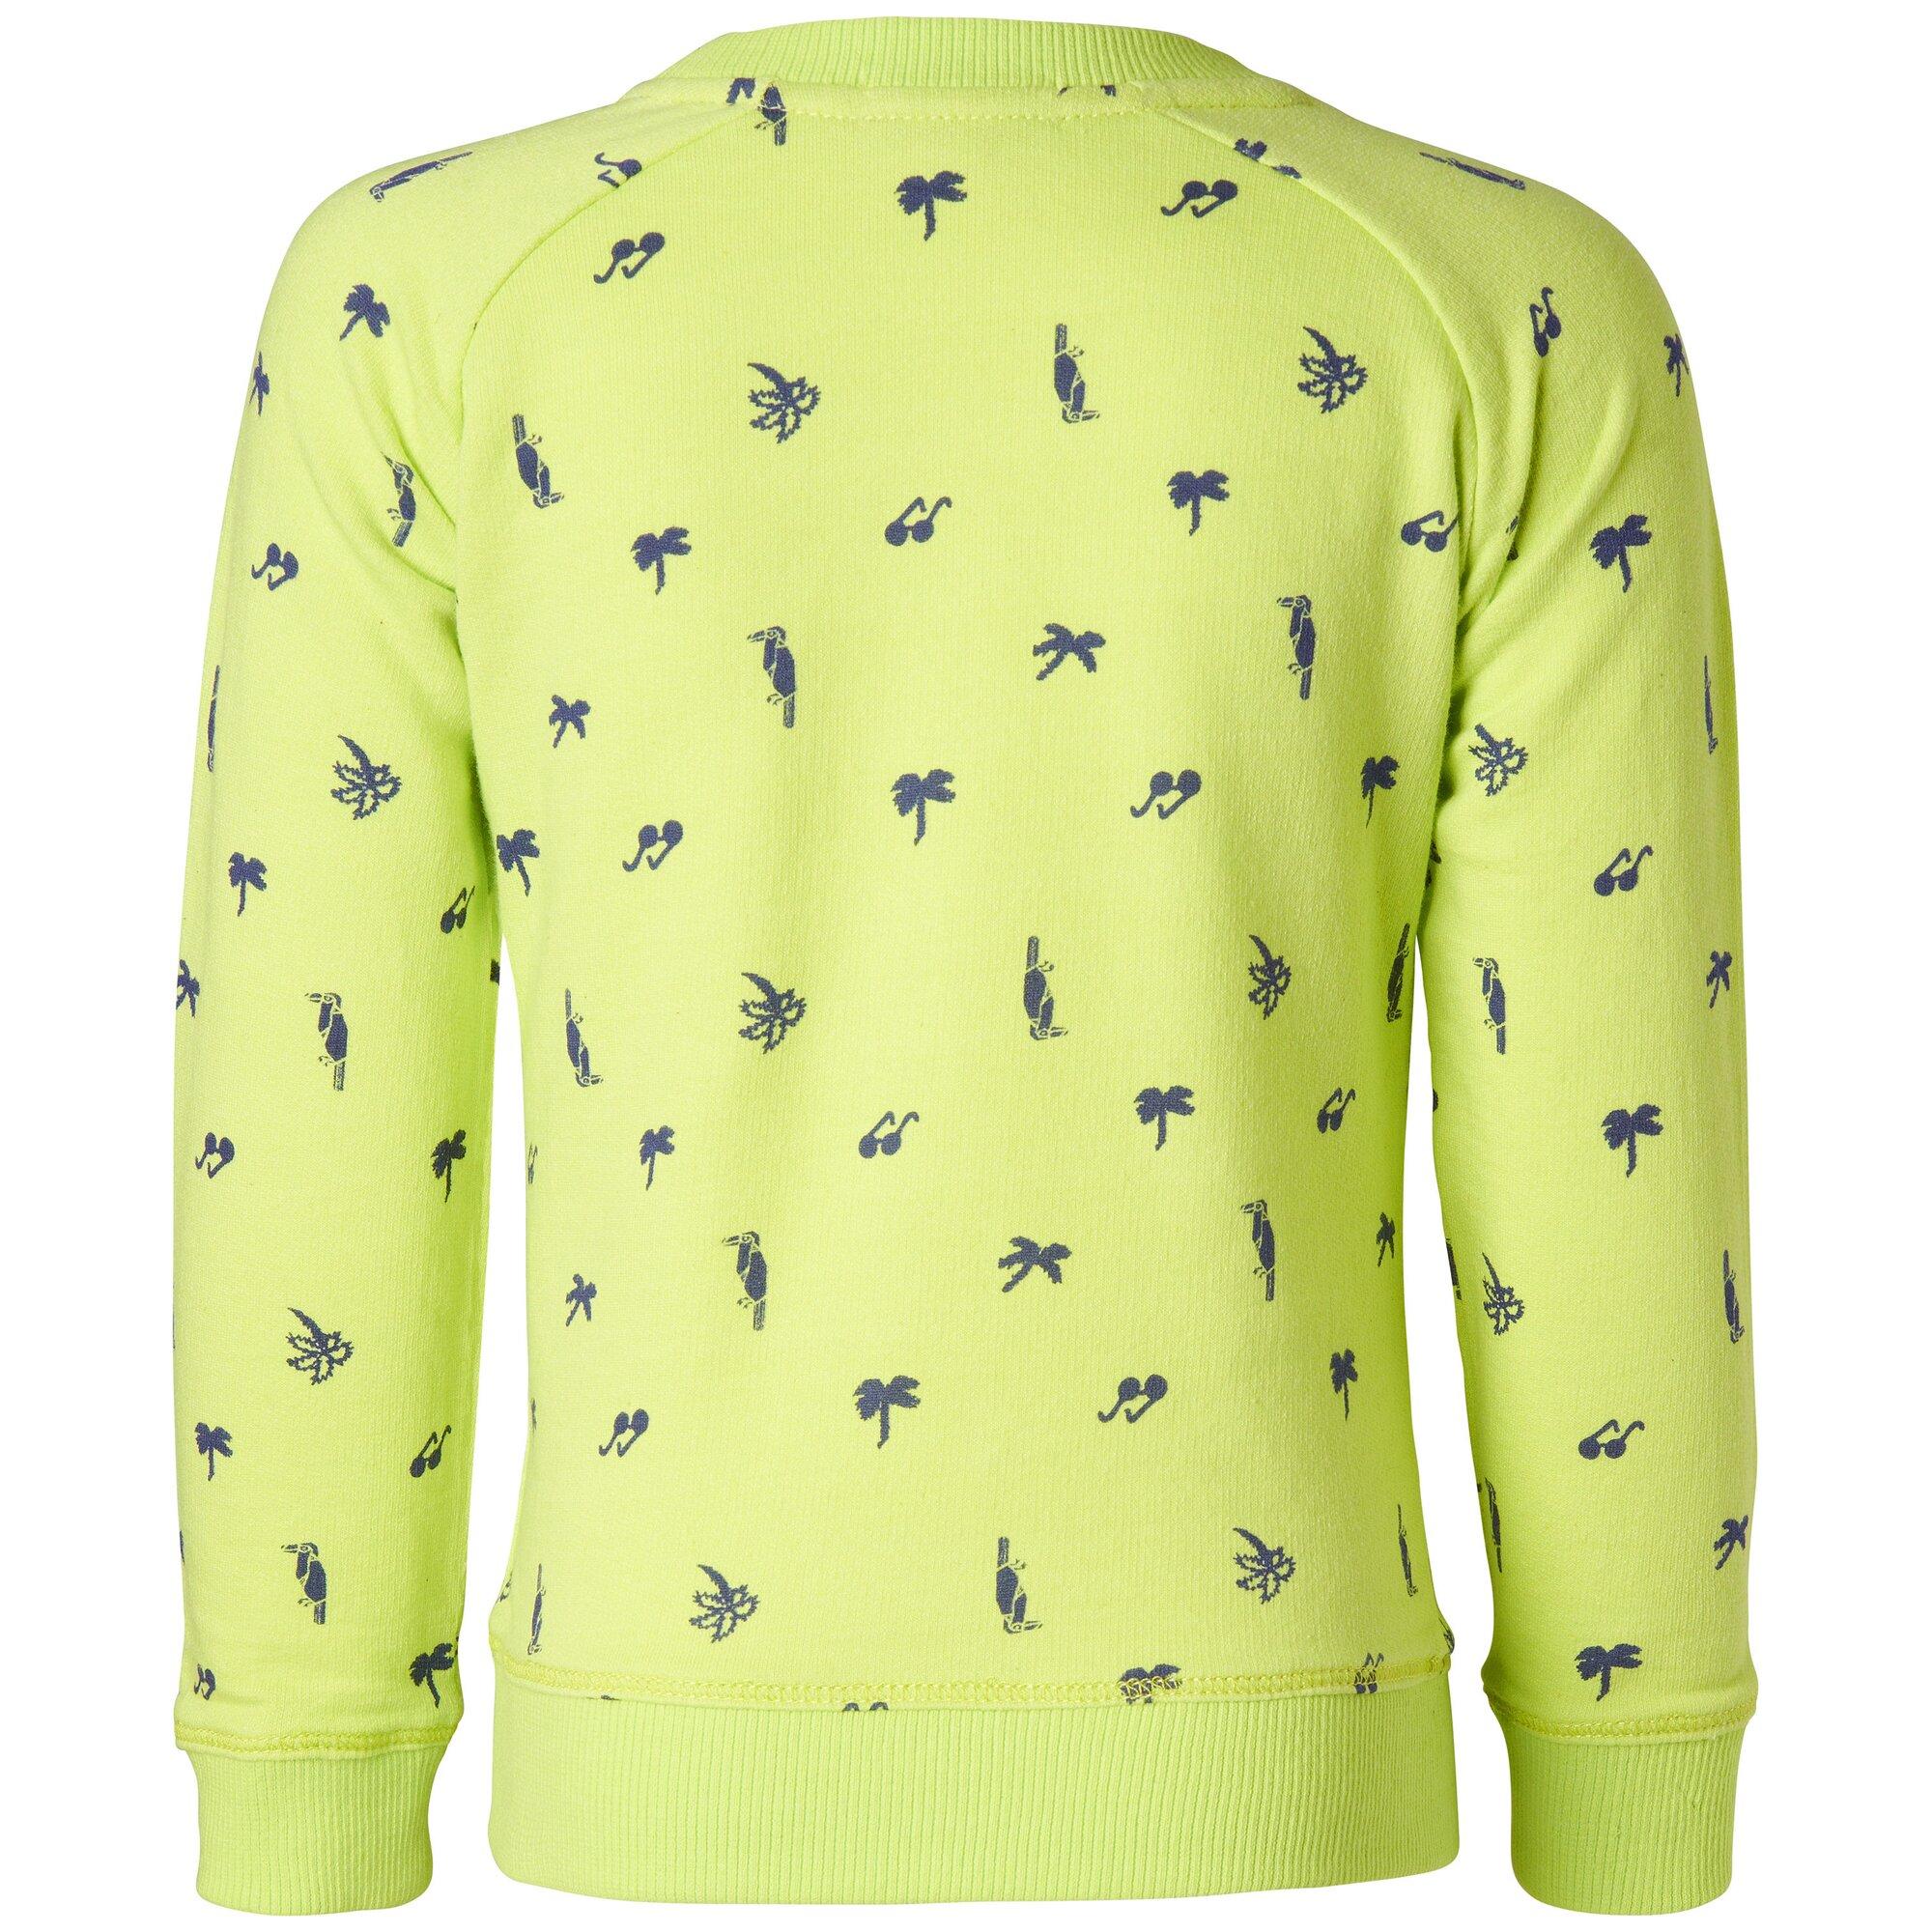 noppies-sweater-ferndale, 34.99 EUR @ babywalz-de